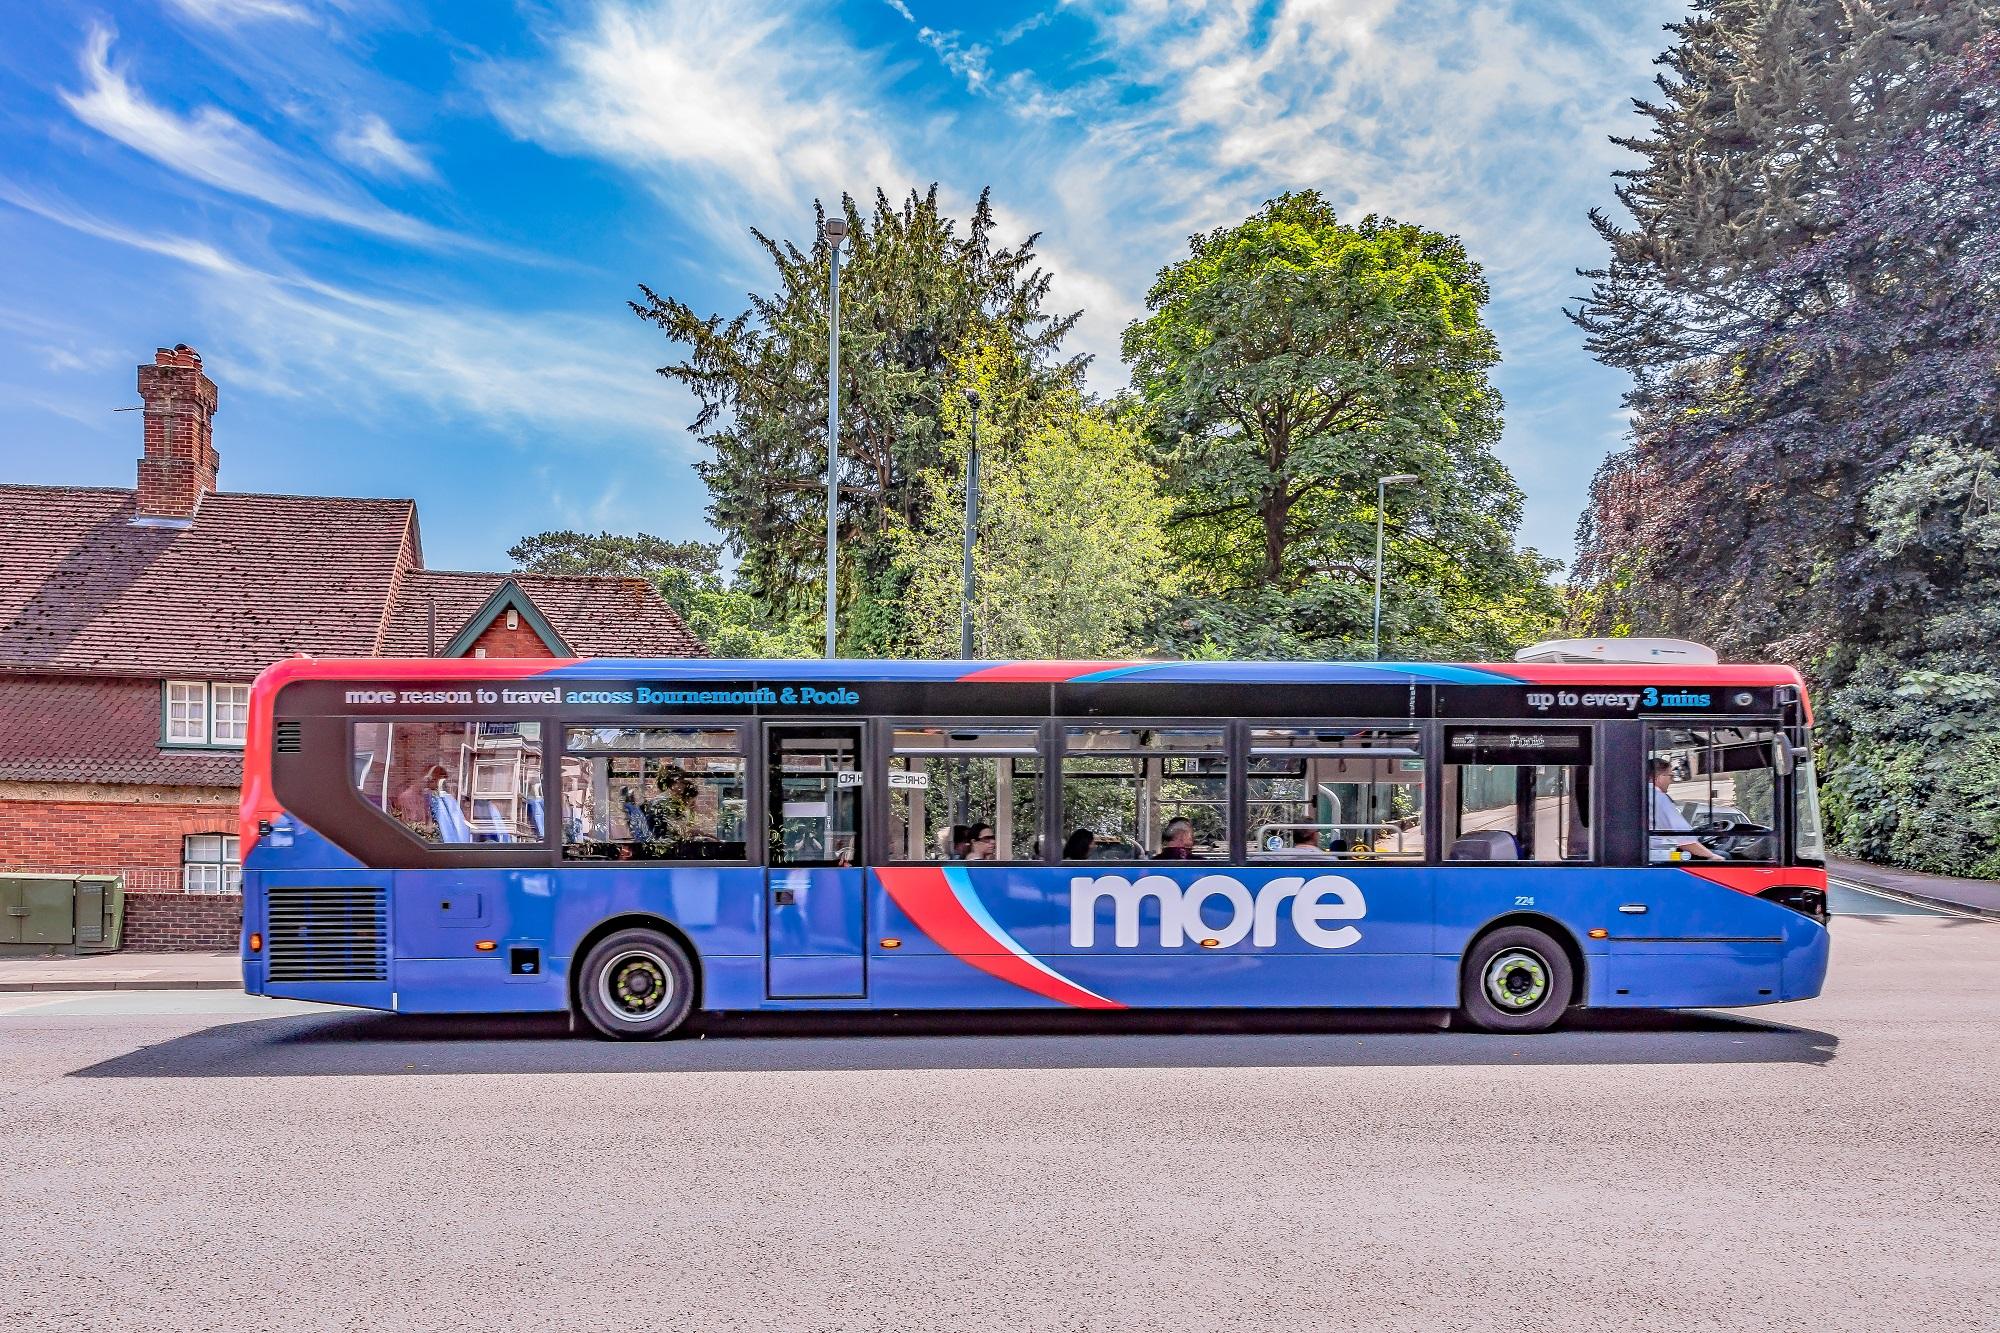 Photo of a morebus en route